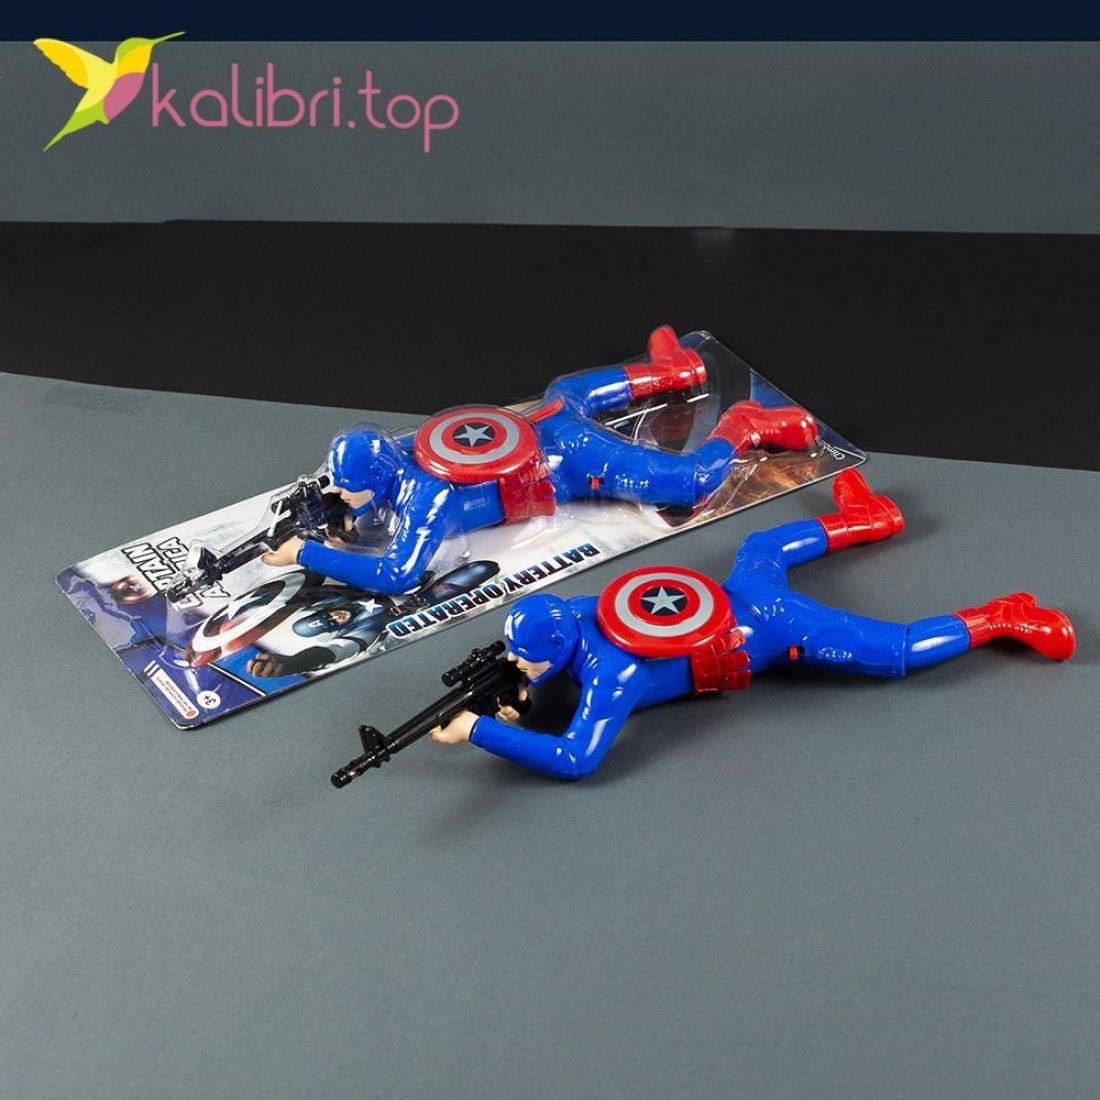 Игрушка ползающий Капитан Америка оптом фото 654